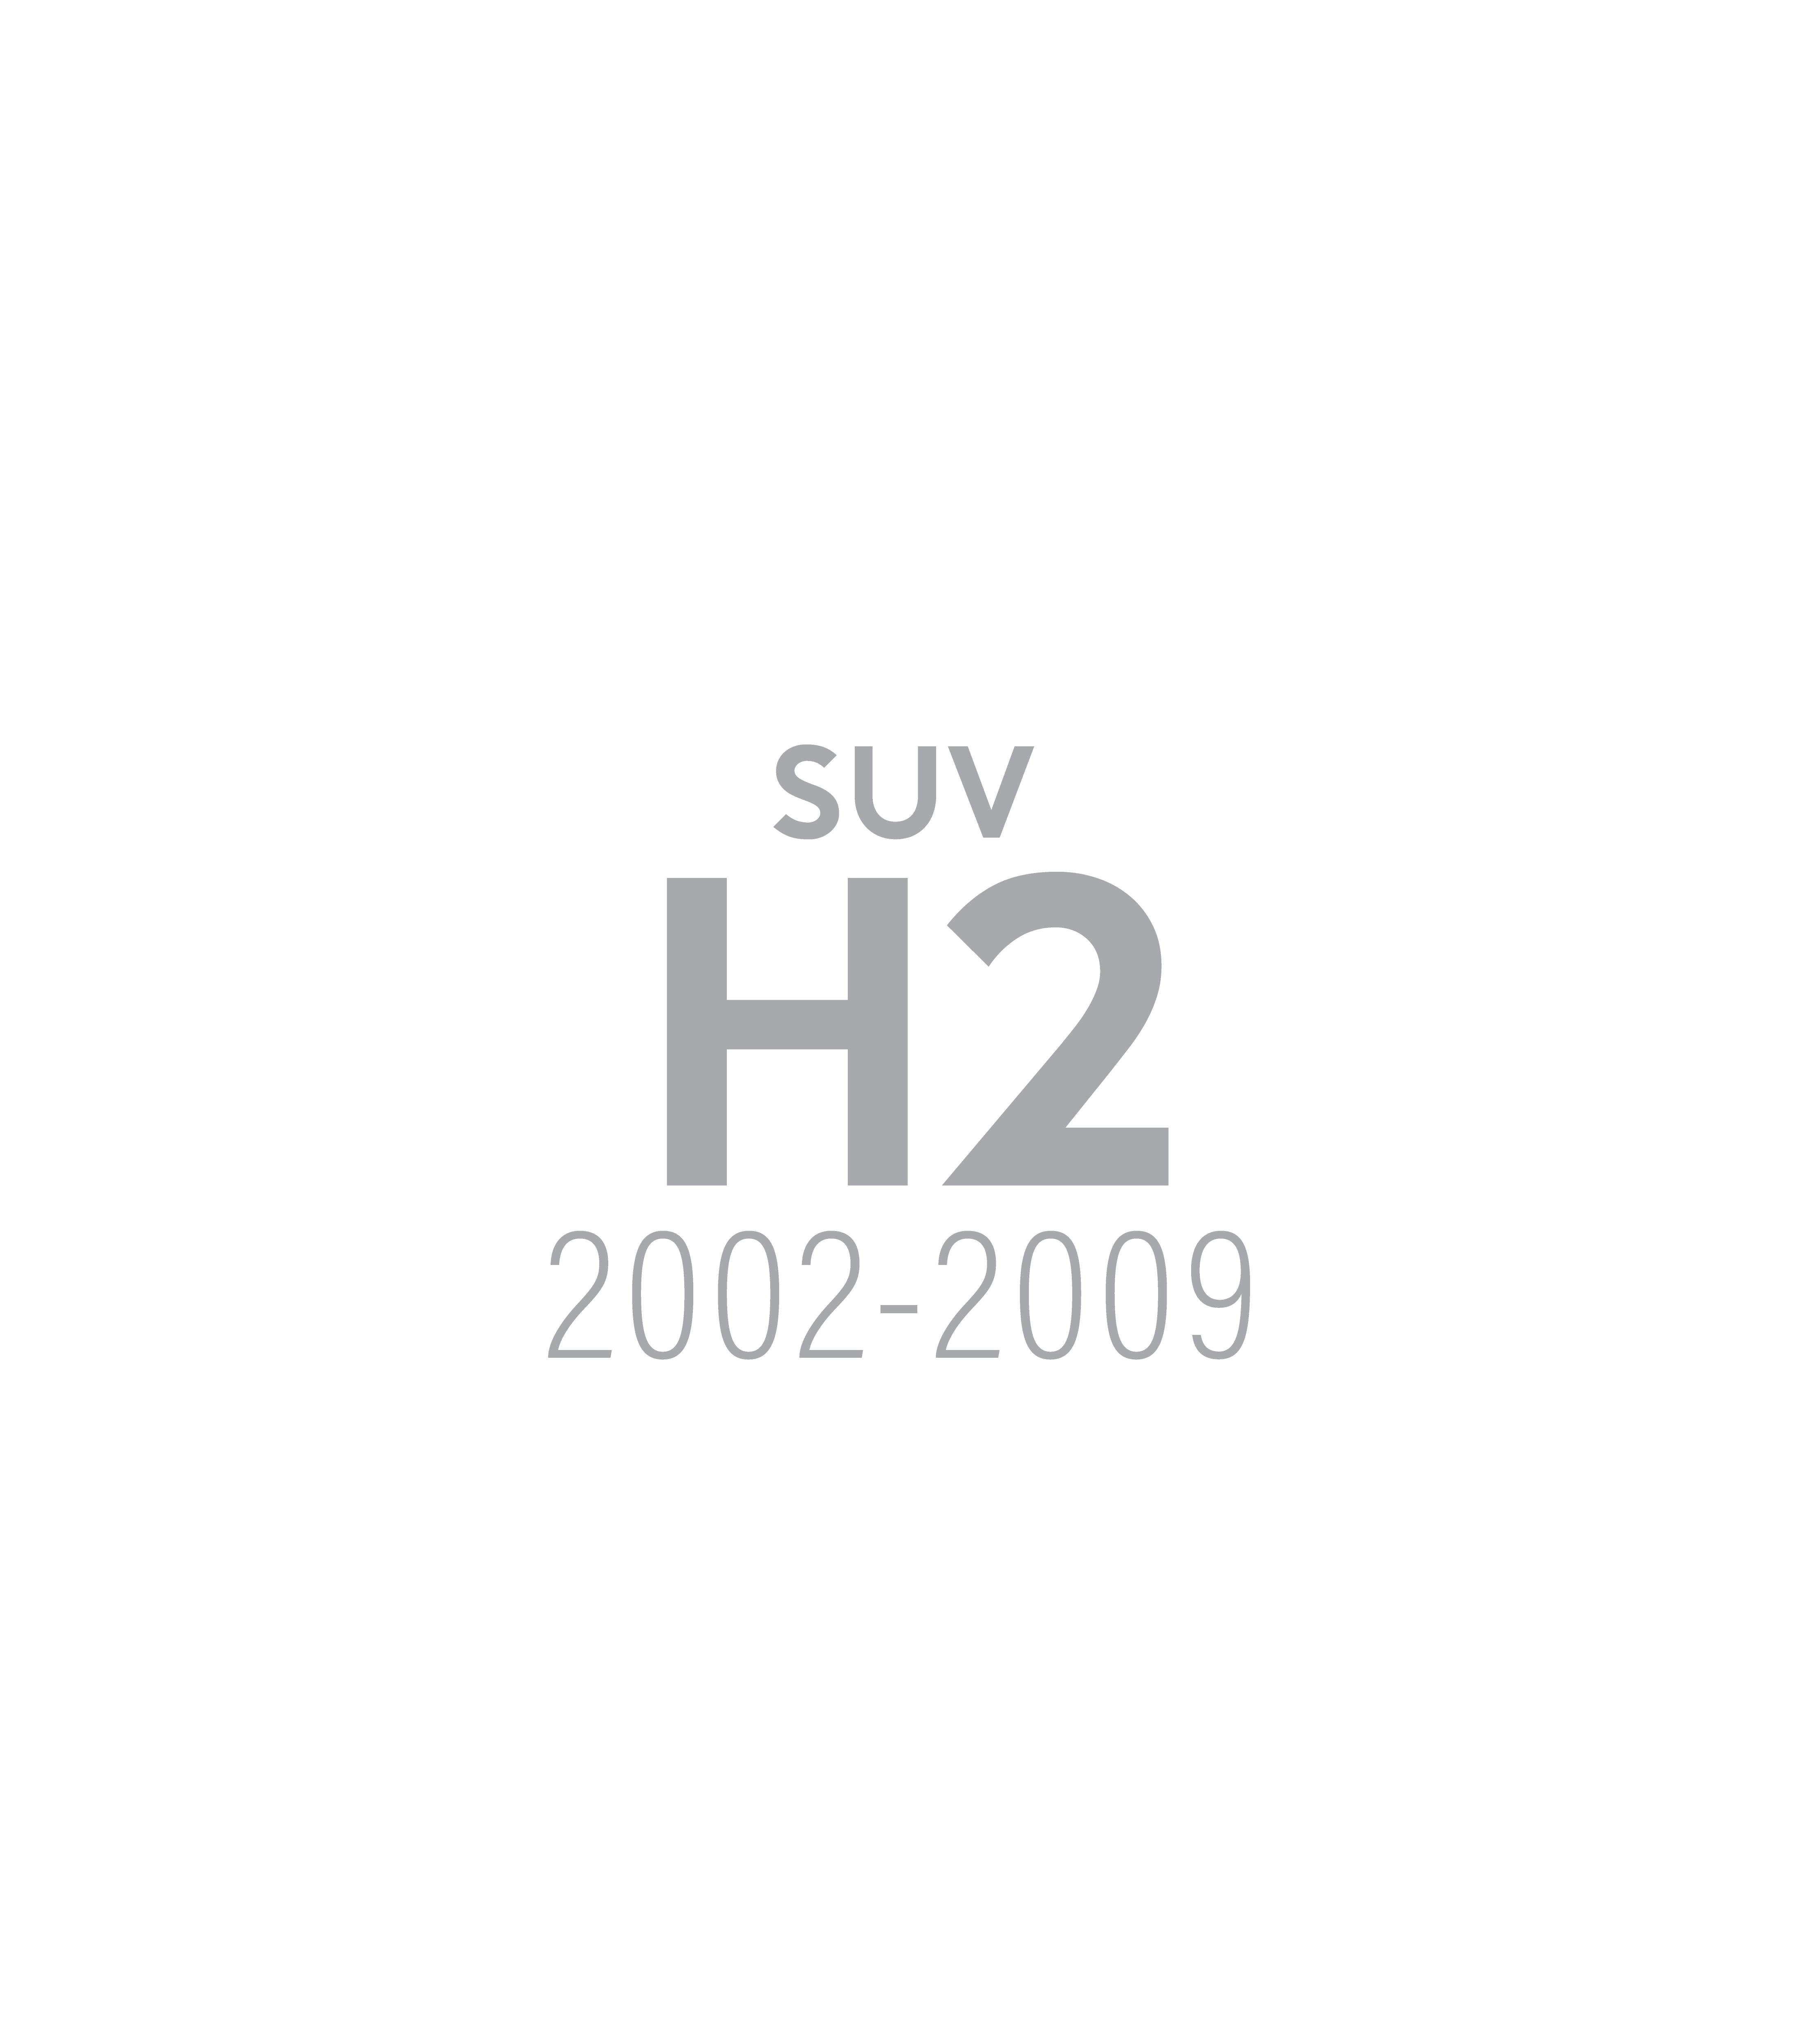 hummer h2 suv gobi gallery image